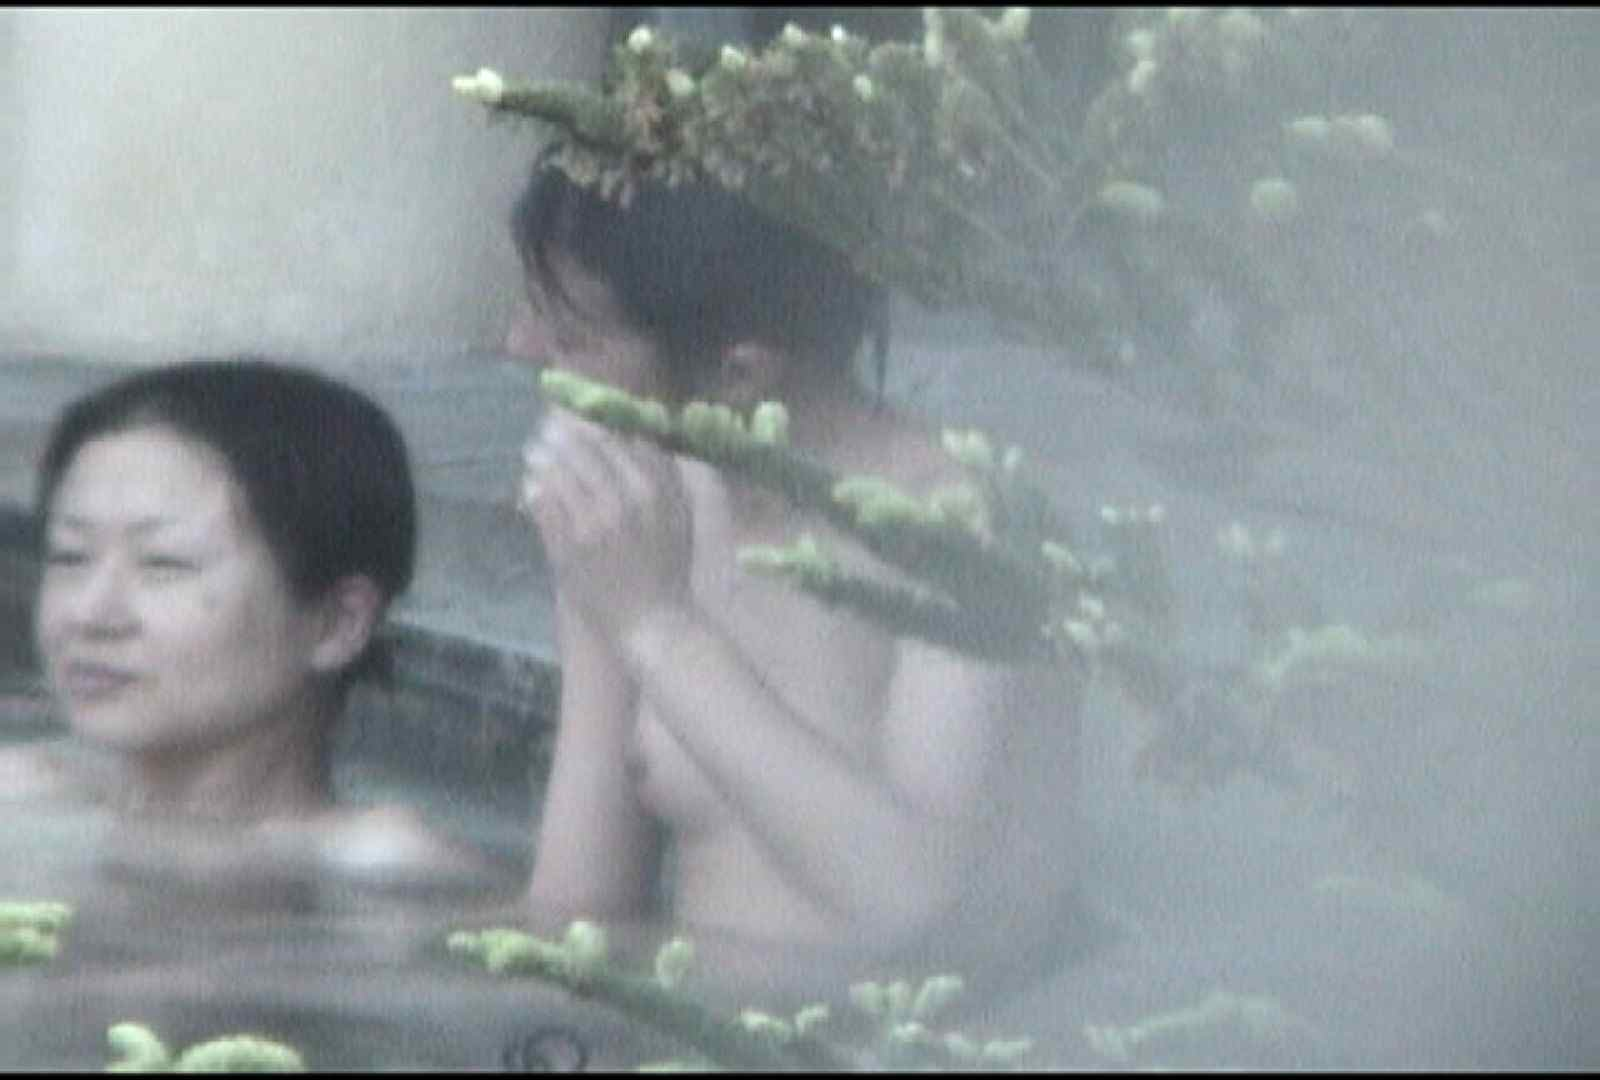 Aquaな露天風呂Vol.15 盗撮映像  42Pix 42